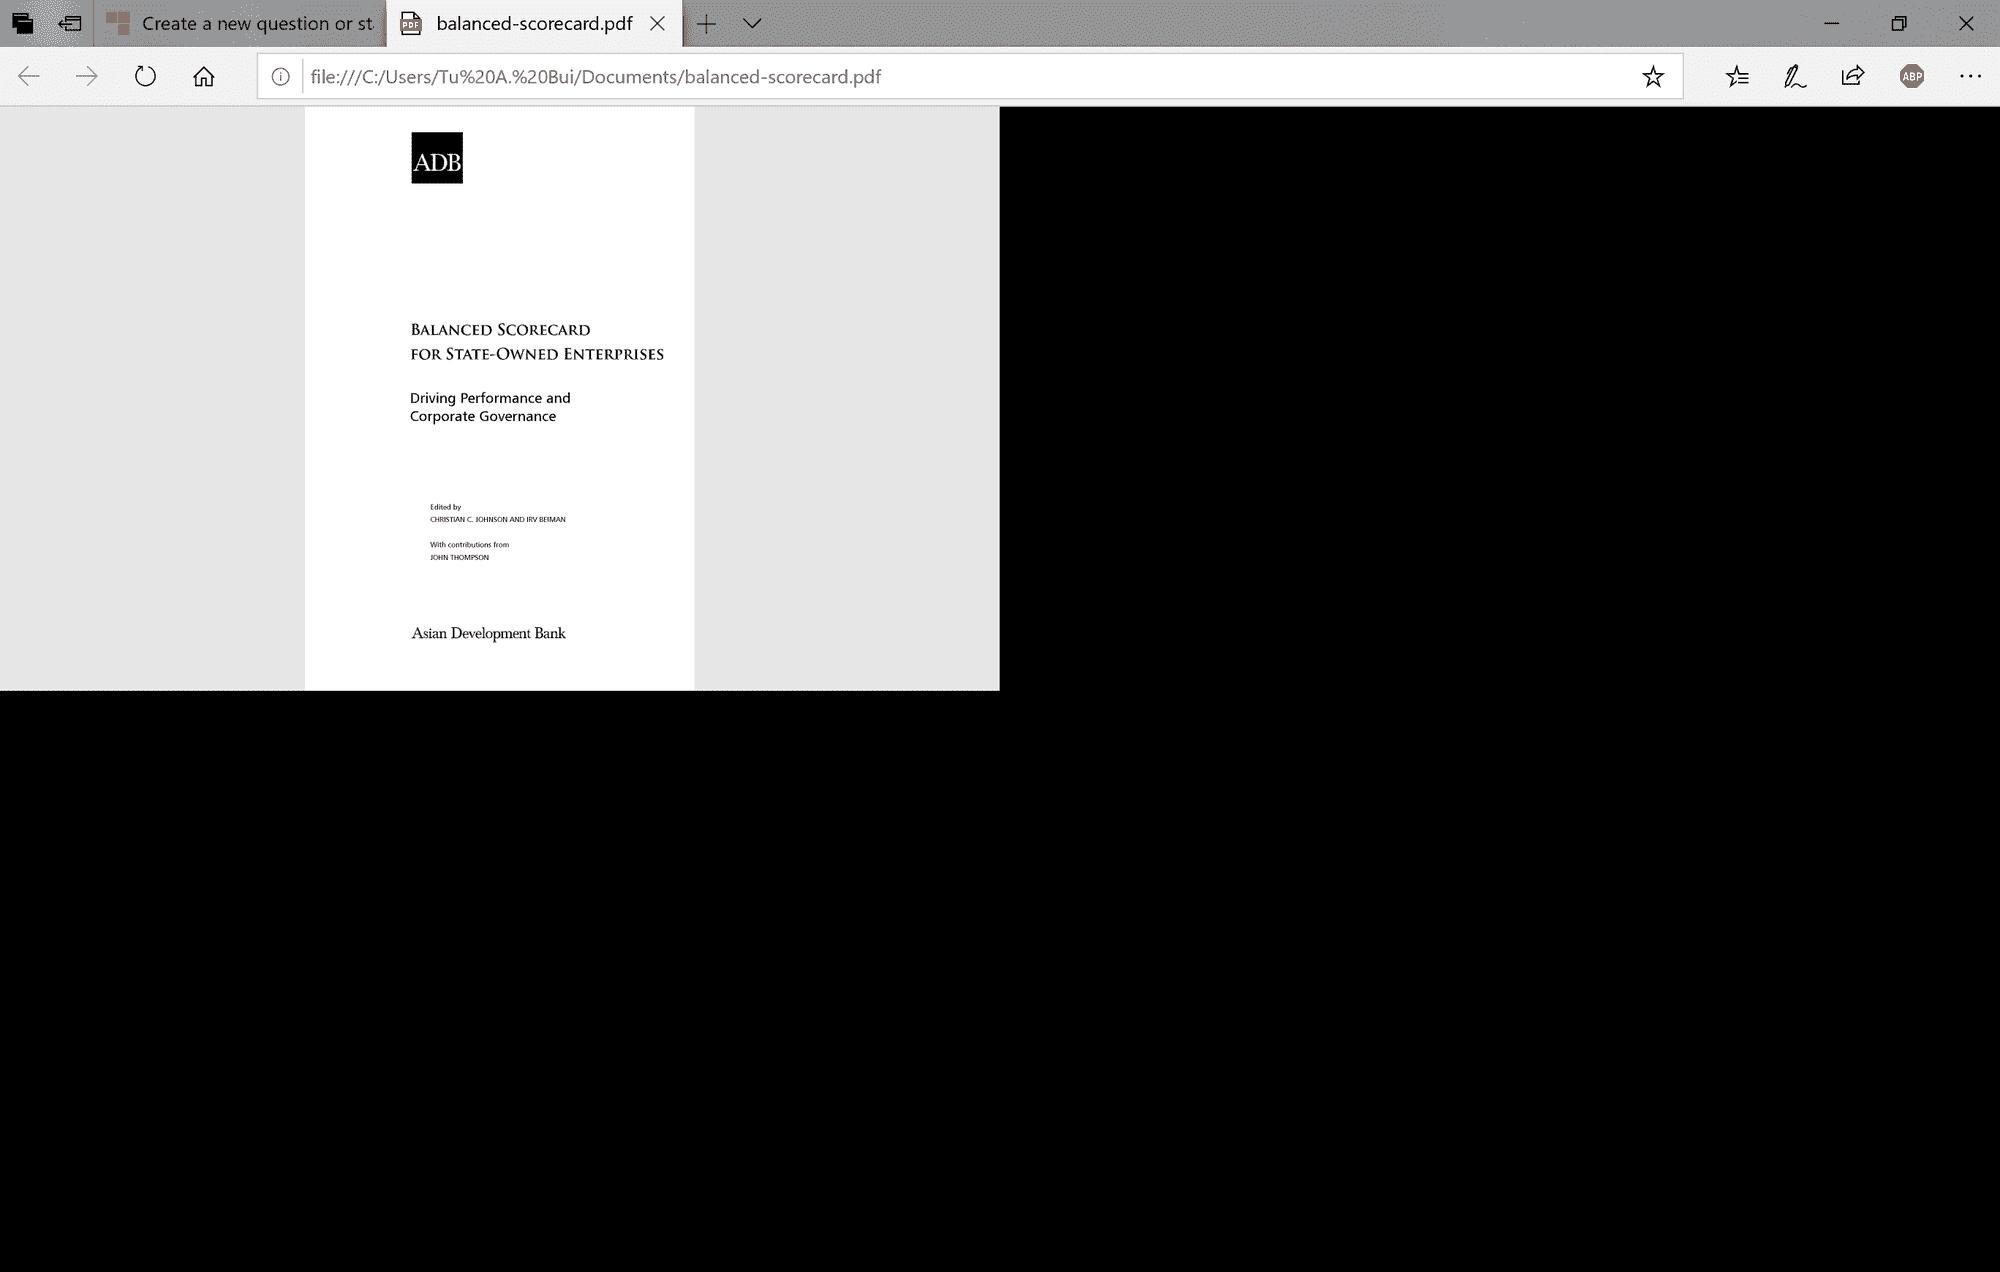 Problem with pdf file when viewing on Microsoft Edge 8cffa1fa-4ec3-4179-8d5c-4a3949ce78e3?upload=true.png